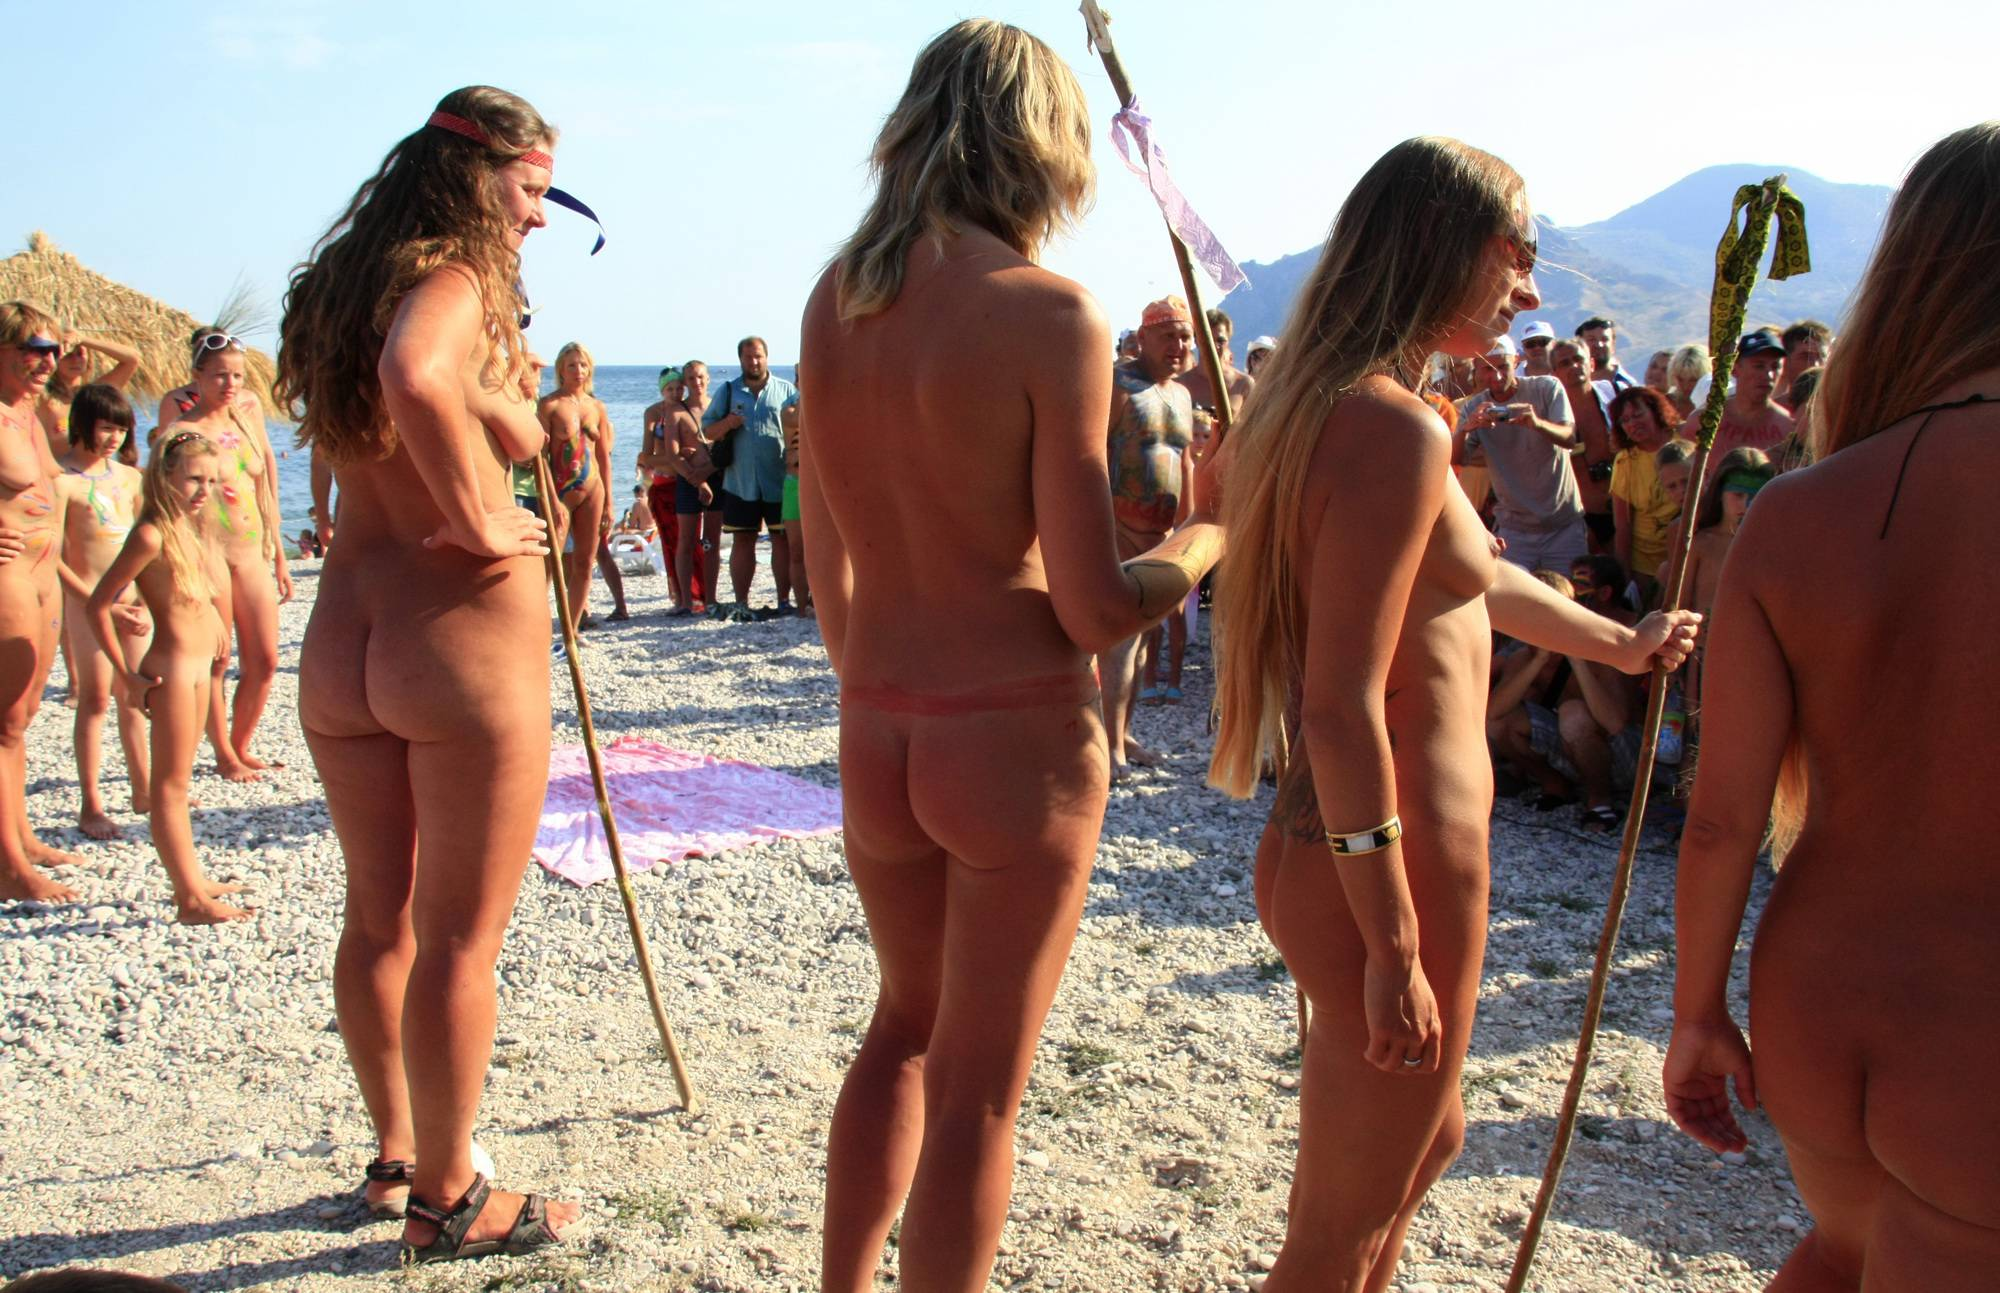 Neptune Nudist Wall Form - 2